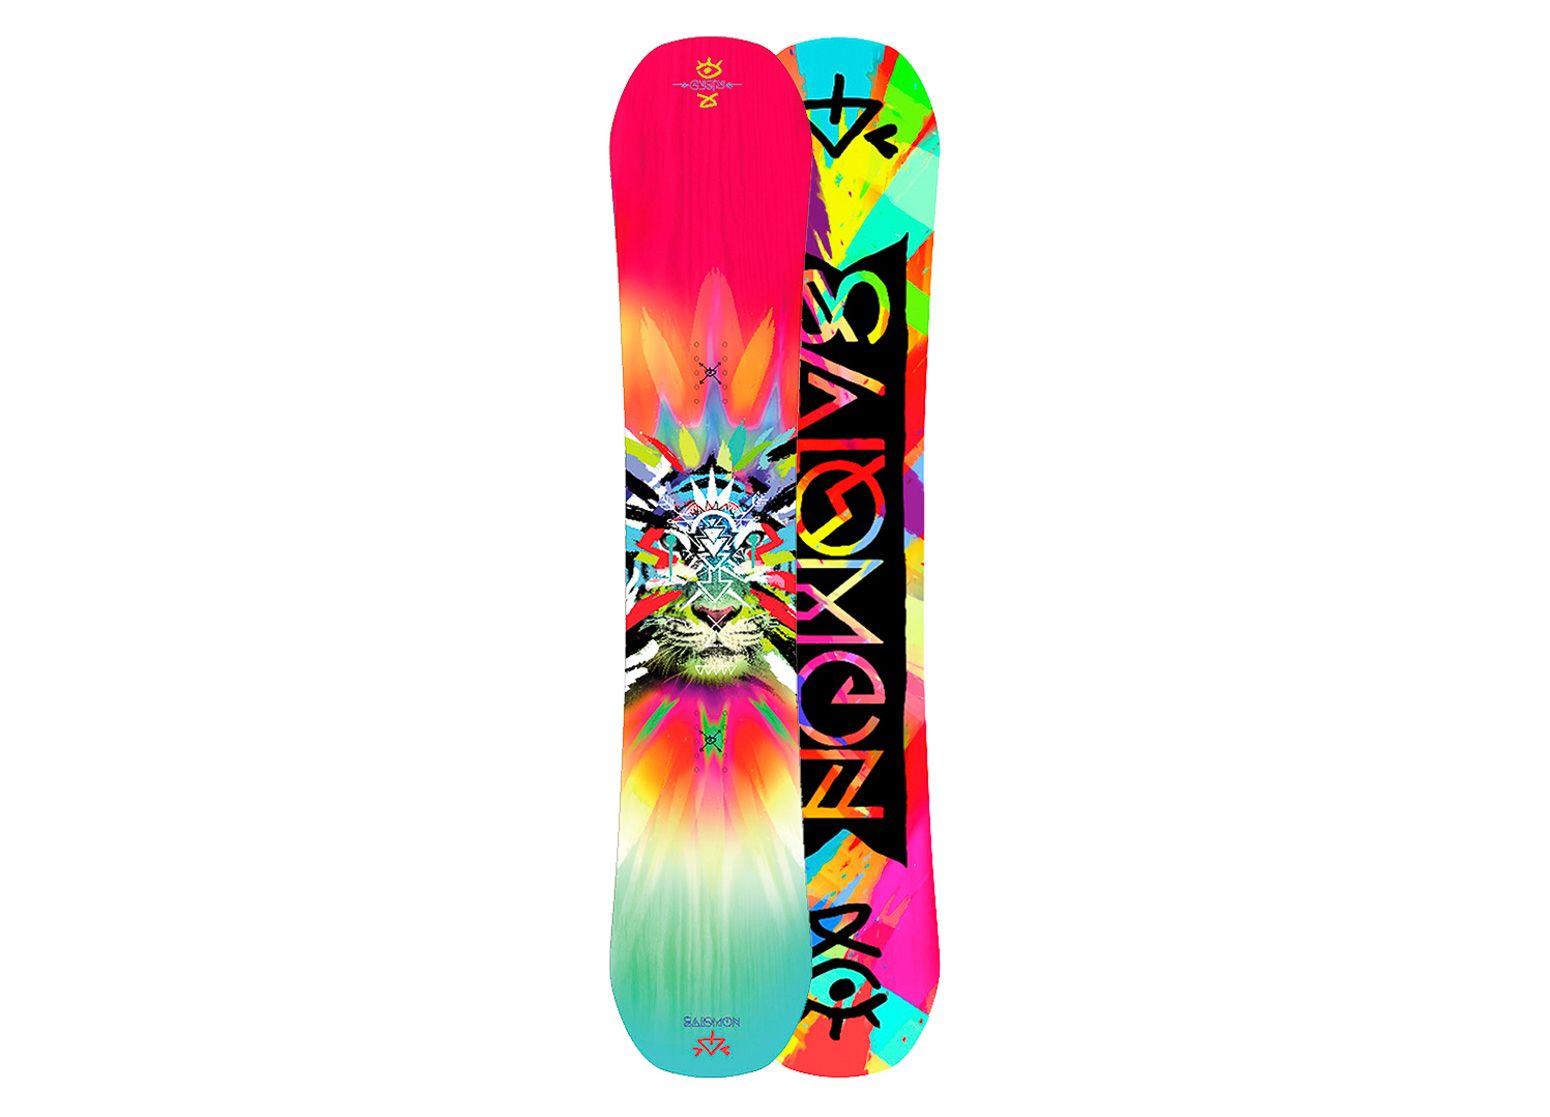 2015 womens ski reviews - Salomon Gypsy 2015 2016 Women S Snowboard Review Whitelines Snowboarding